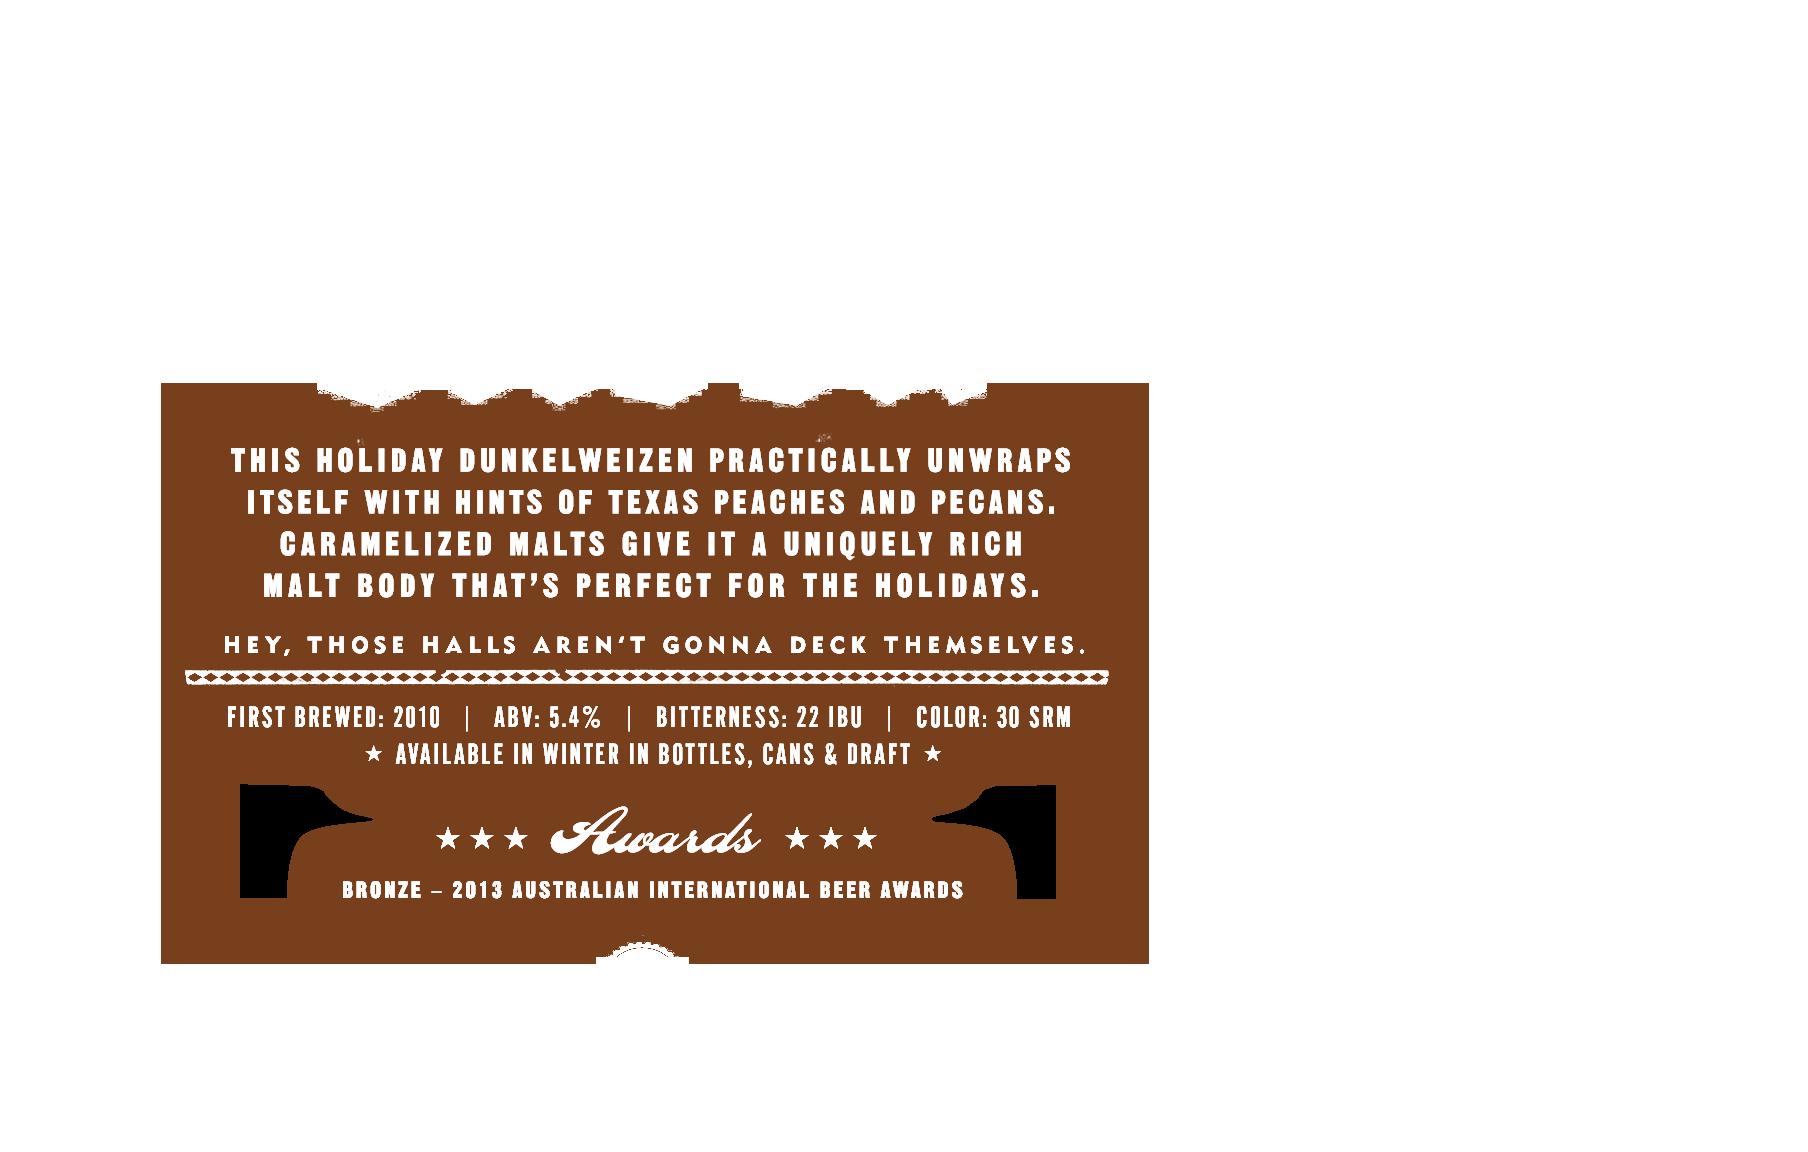 Hdshrczerfaiqcayl7al cheer